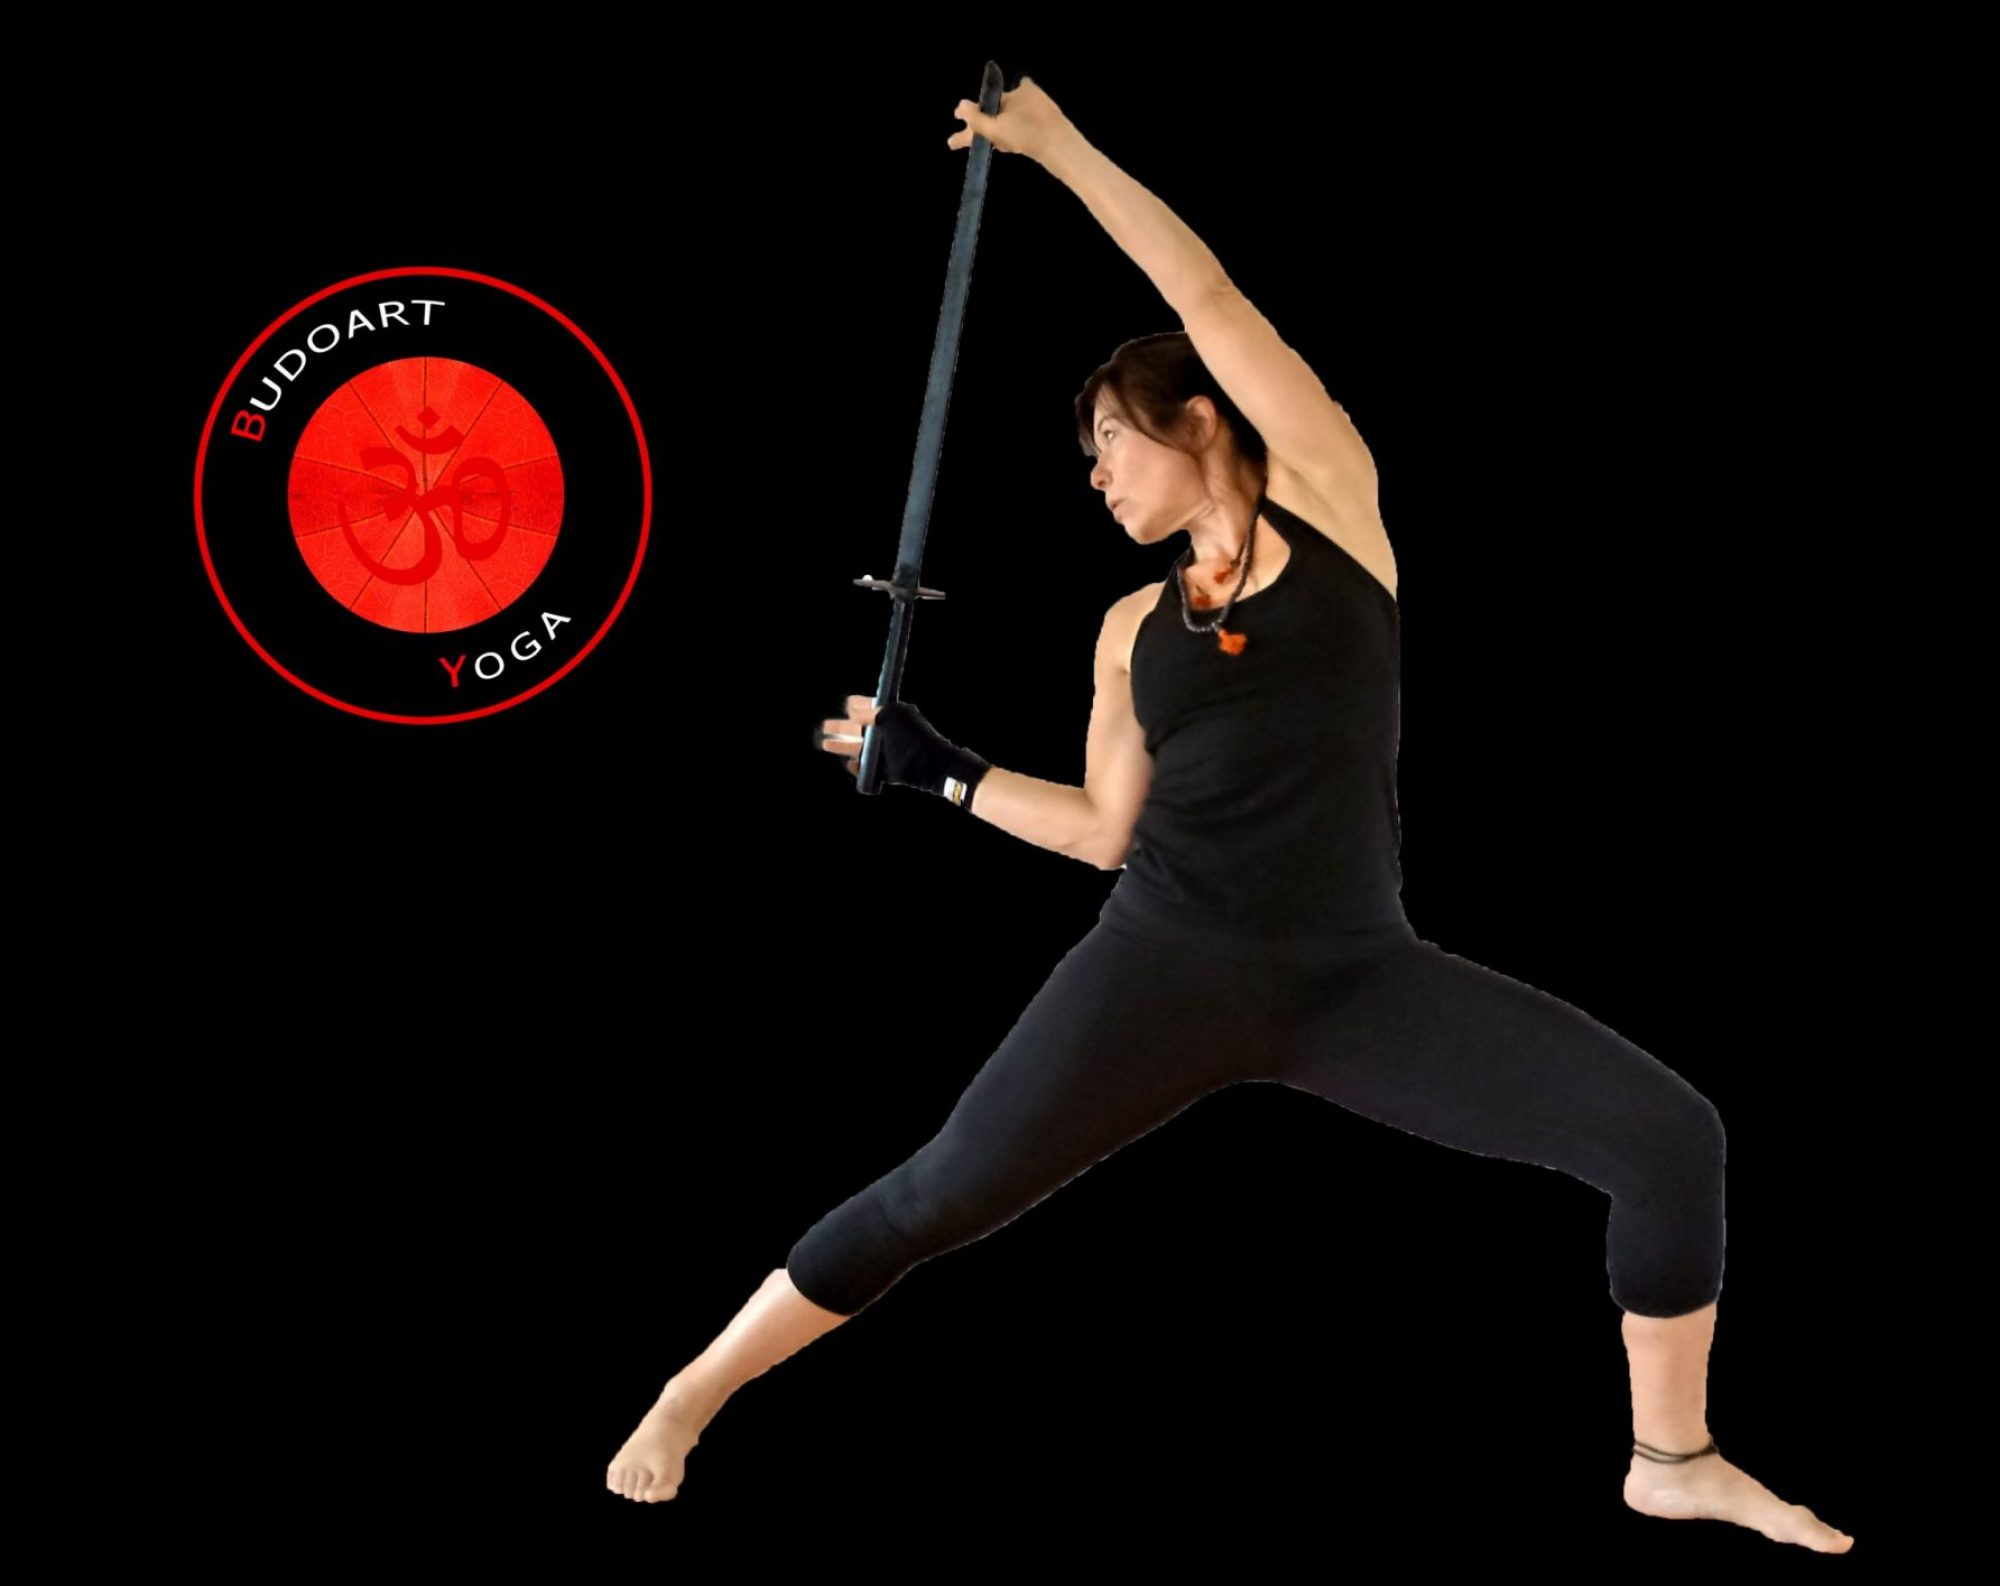 BudoART-Yoga